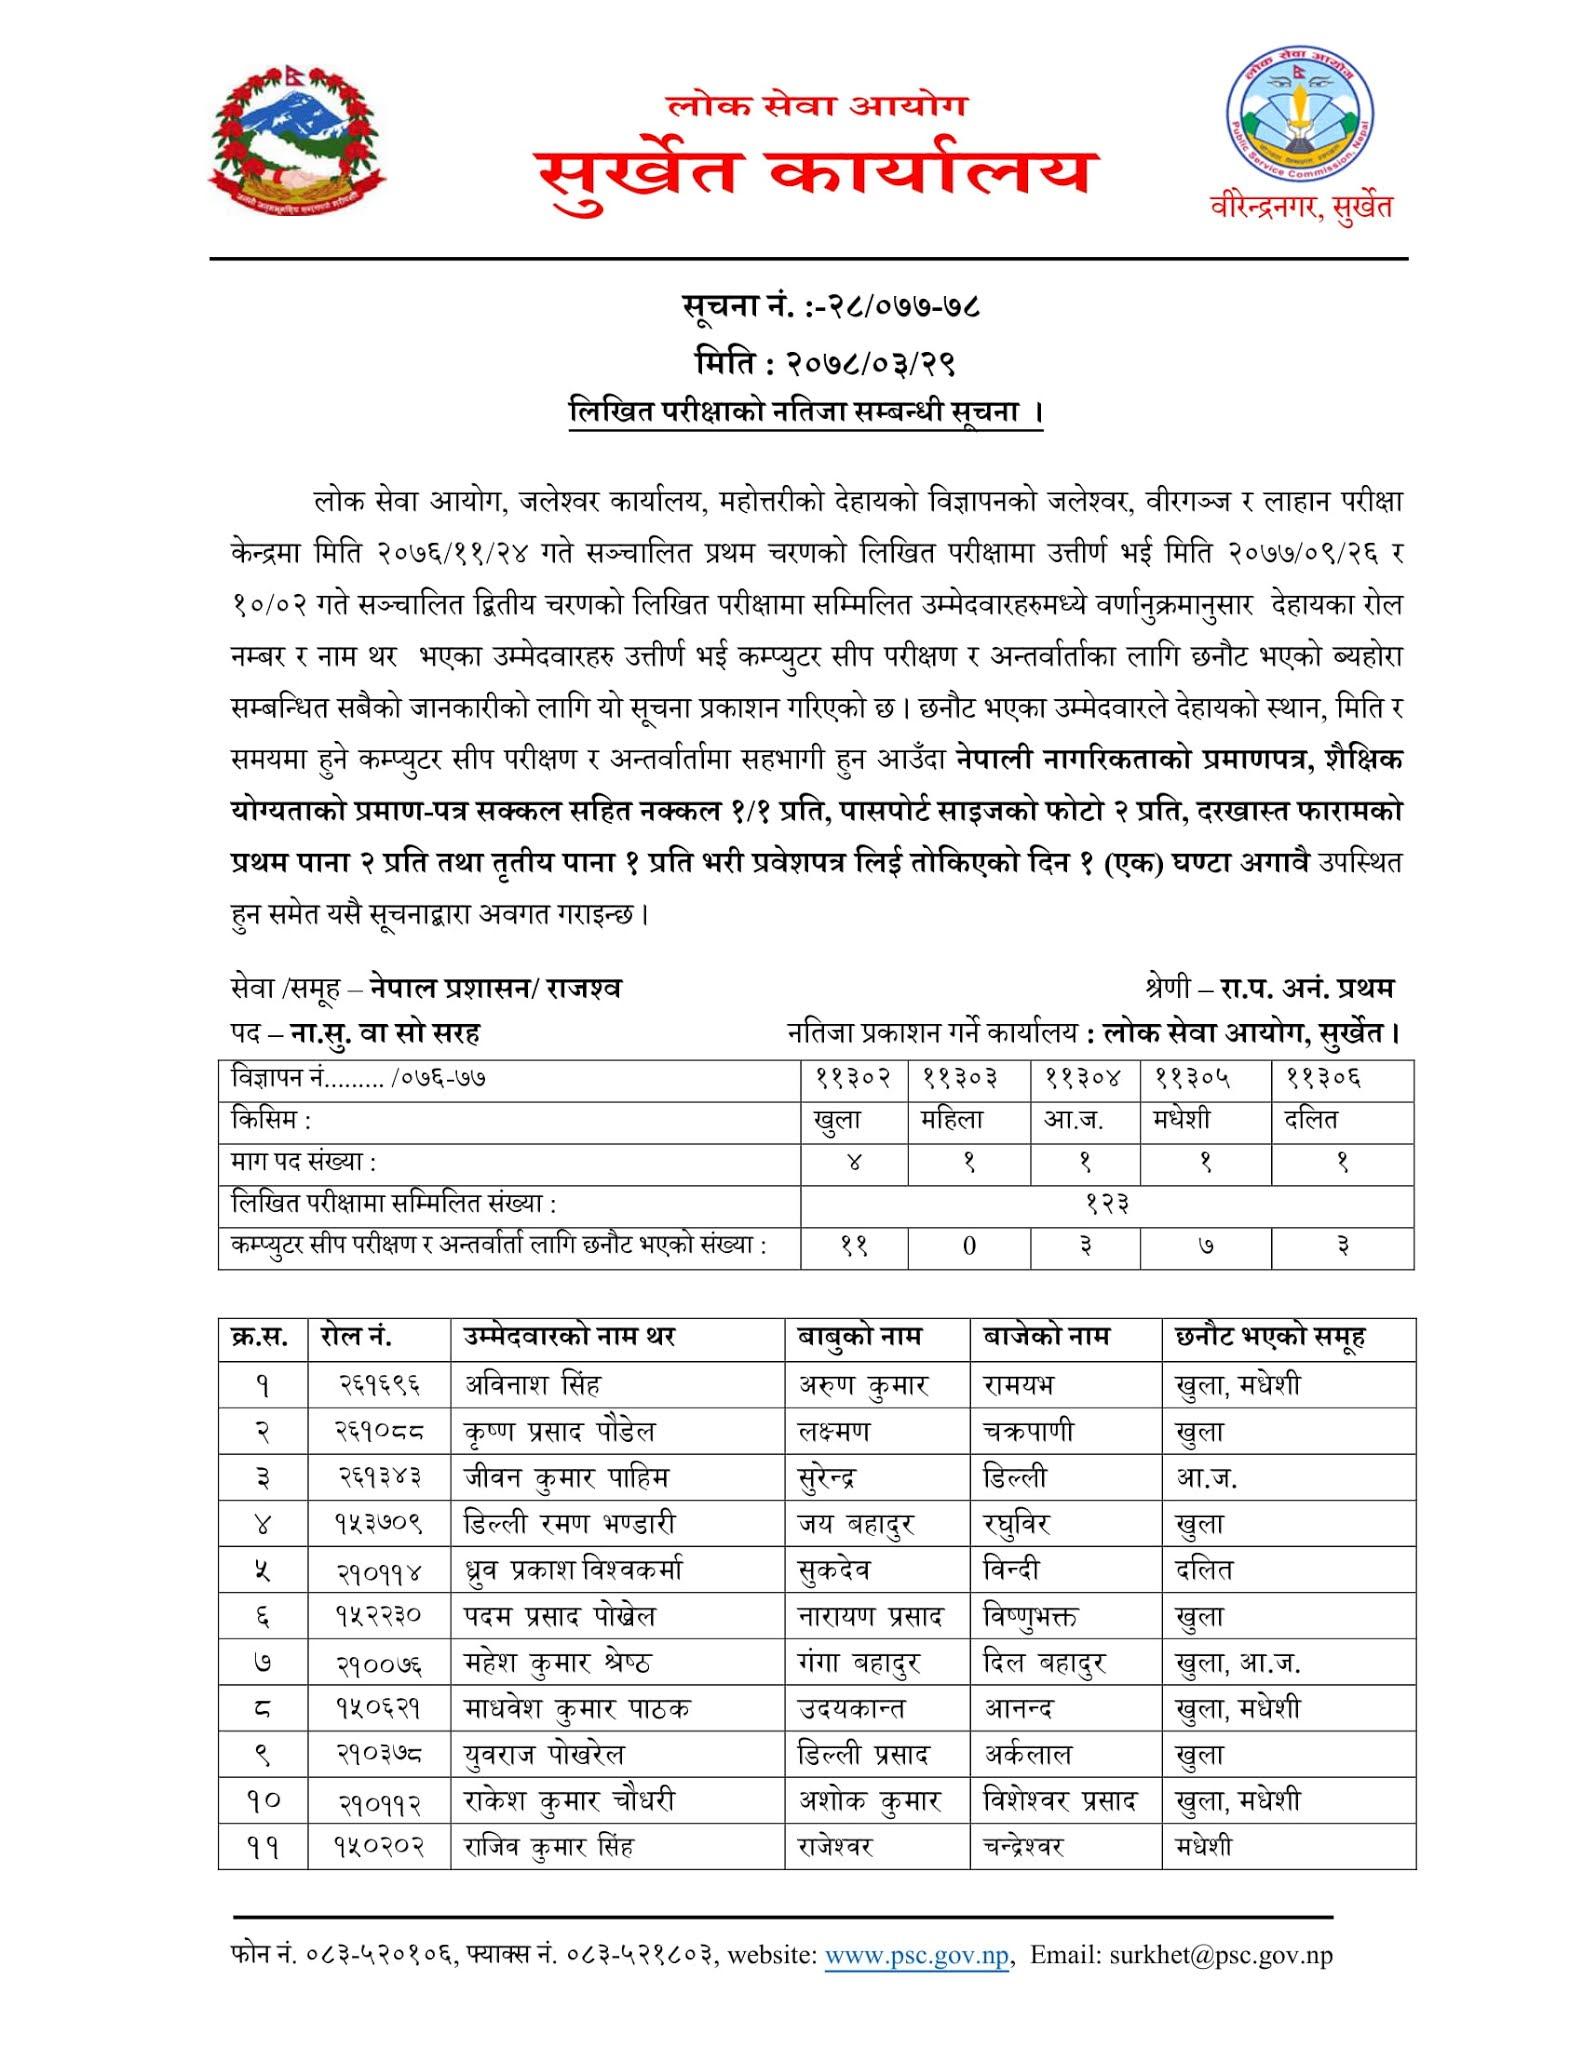 Jaleshwor Lok Sewa Aayog Written Exam Result & Exam Schedule of NASU Revenue published by Surkhet Lok Sewa Aayog